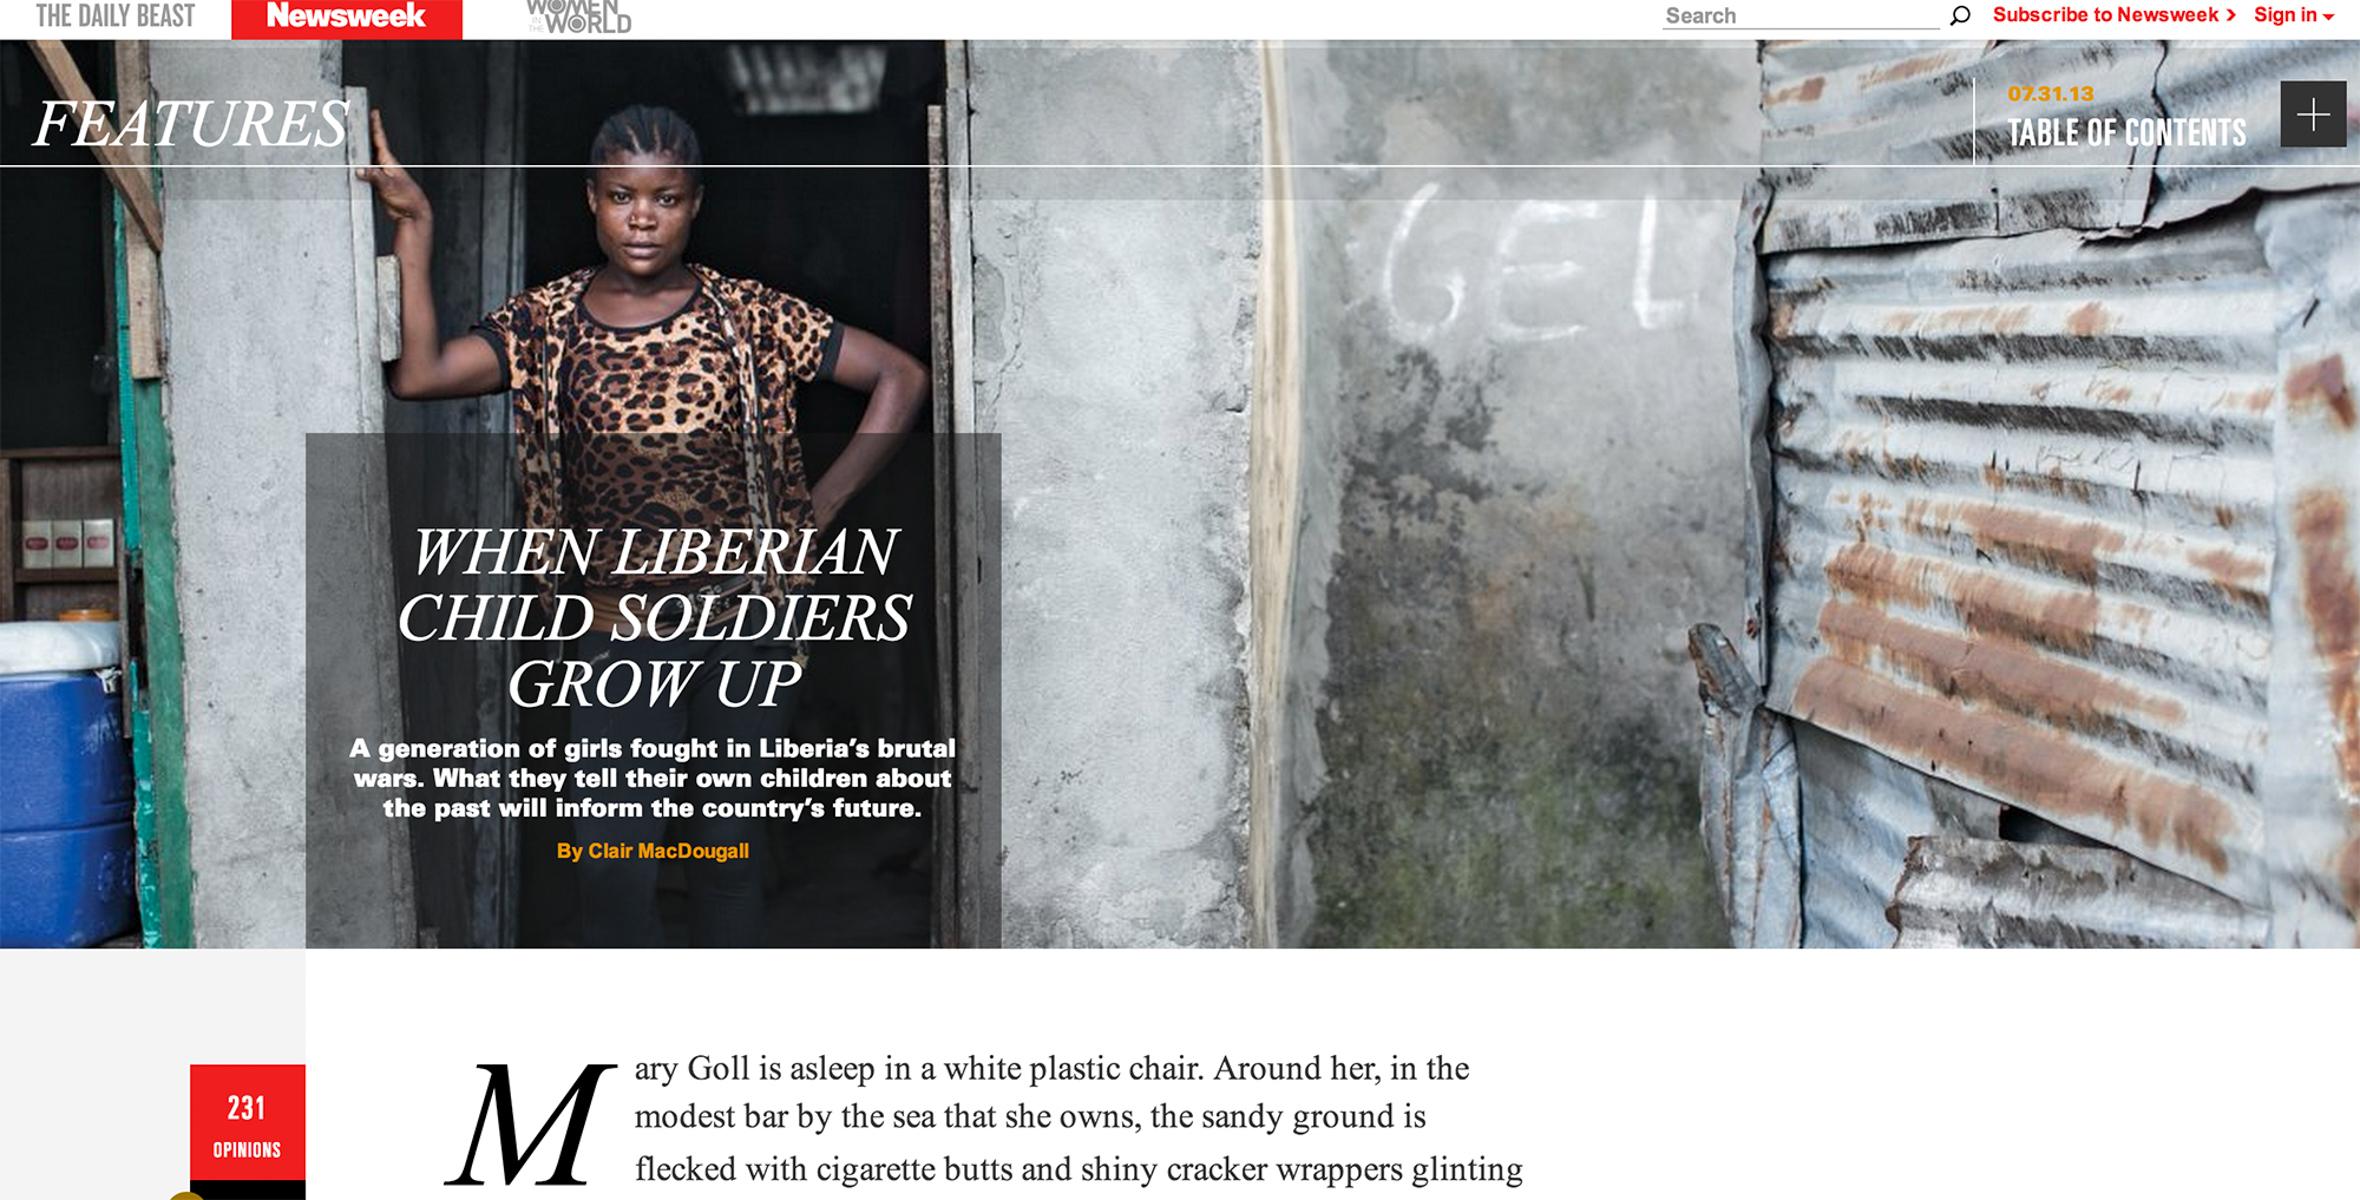 7_Newsweek_liberia